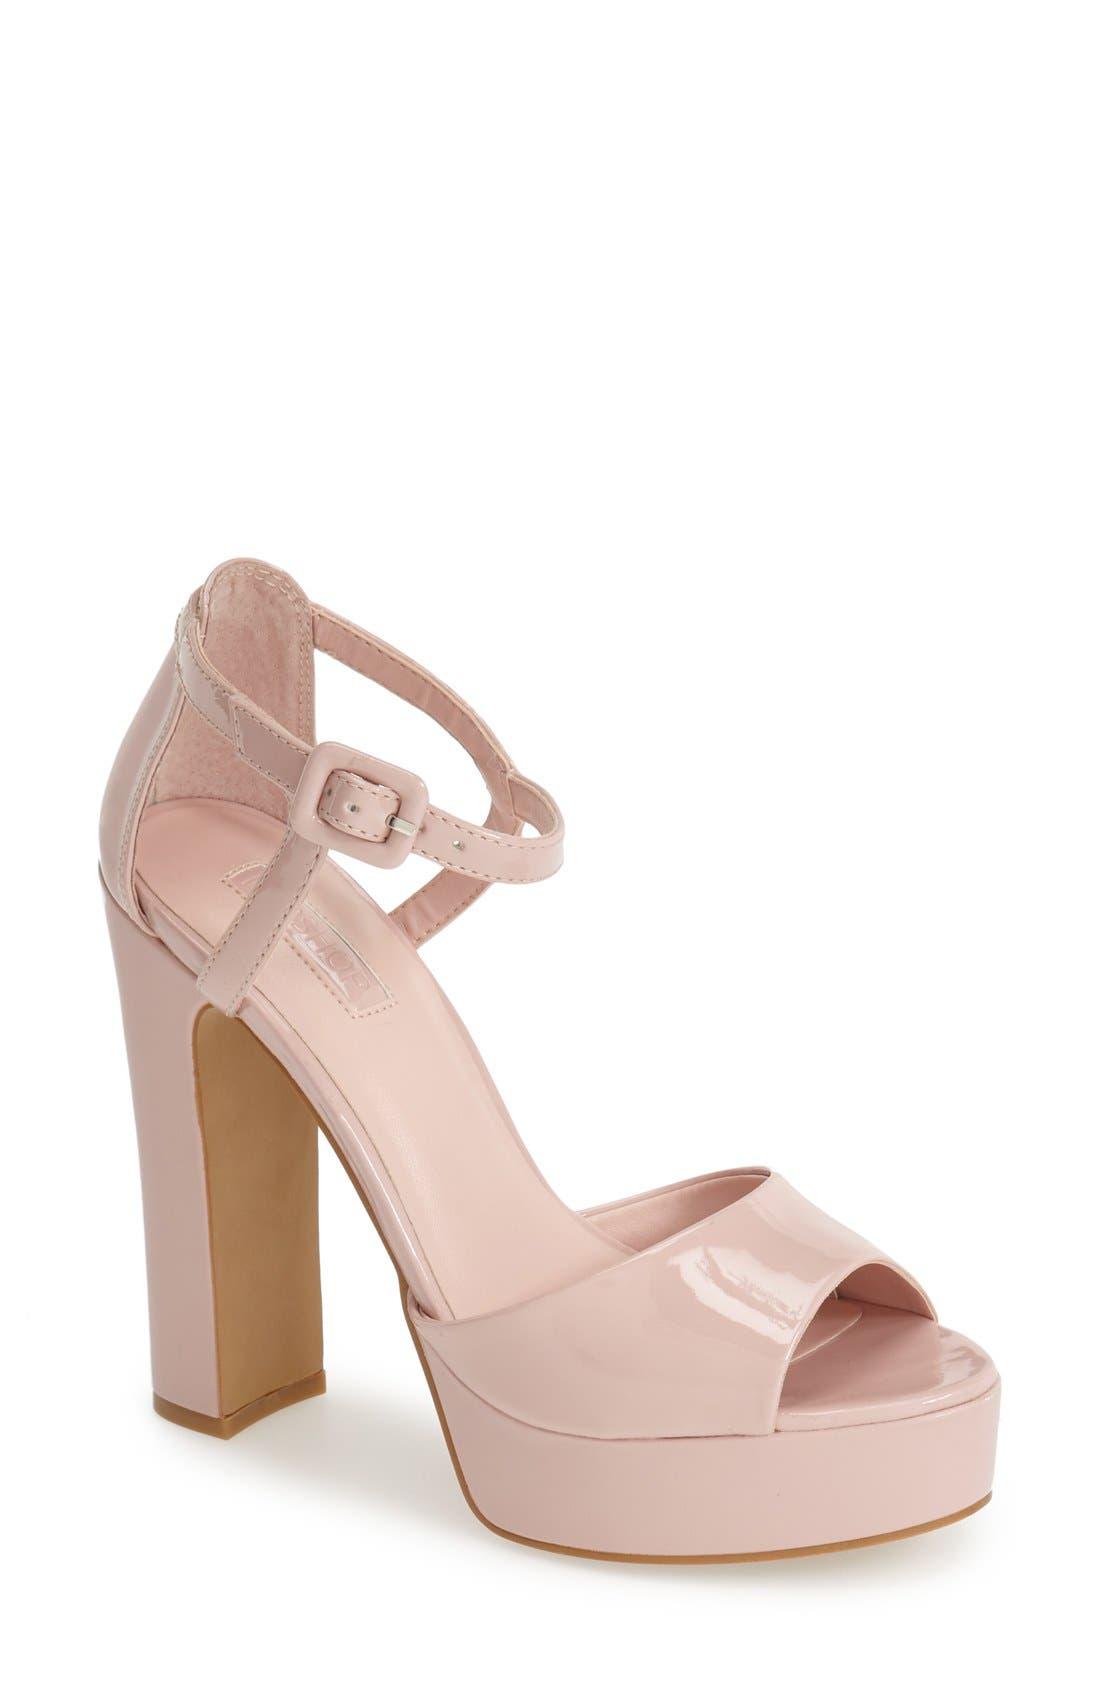 Main Image - Topshop 'Lena' Ankle Strap Platform Sandal (Women)